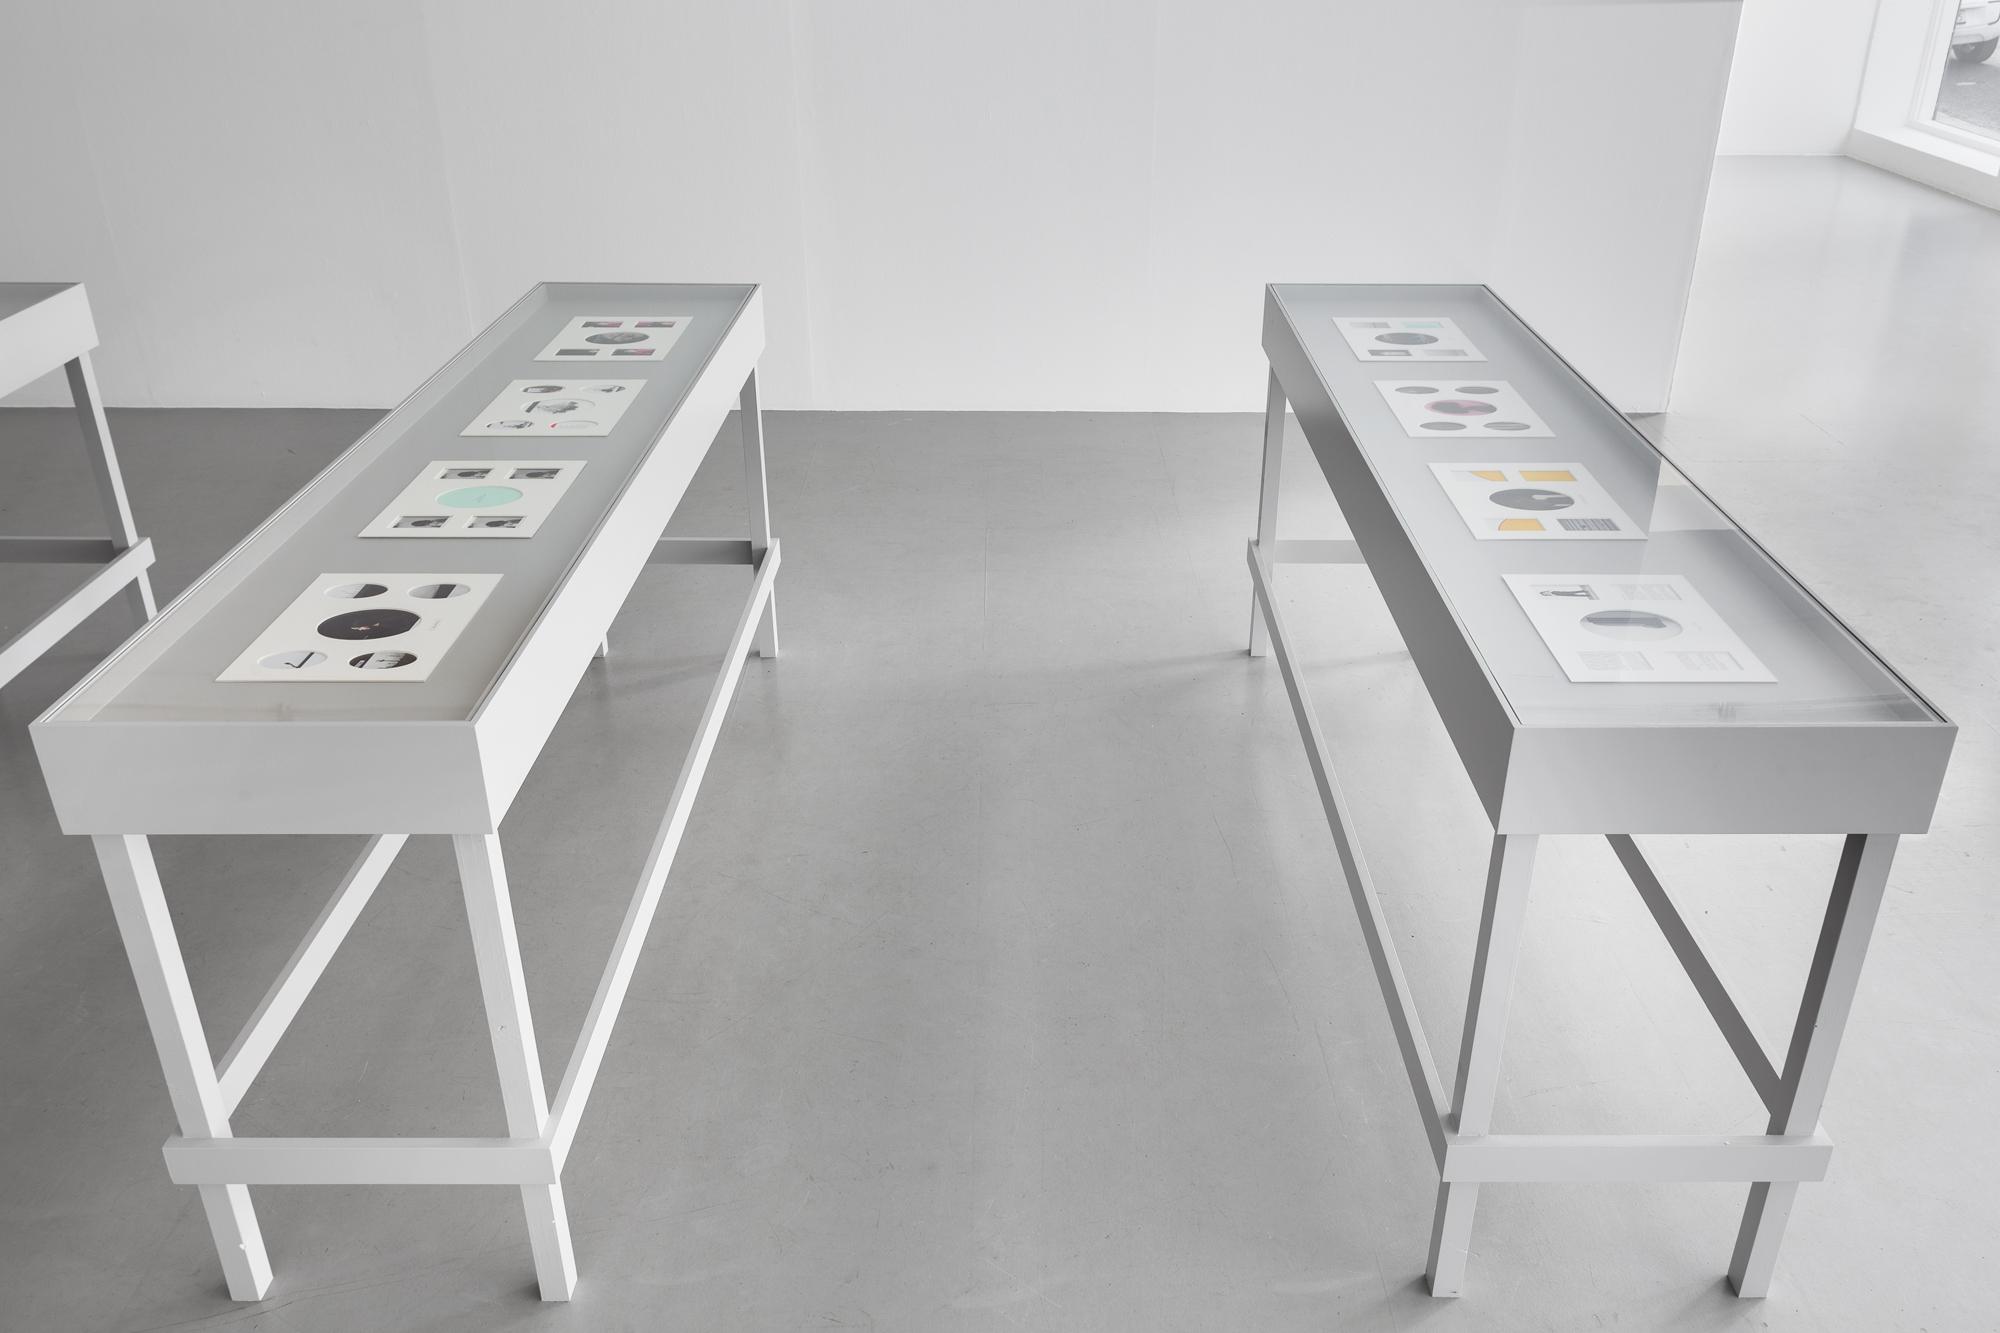 installation of Album 31, Fotogalleriet, Oslo, 2015